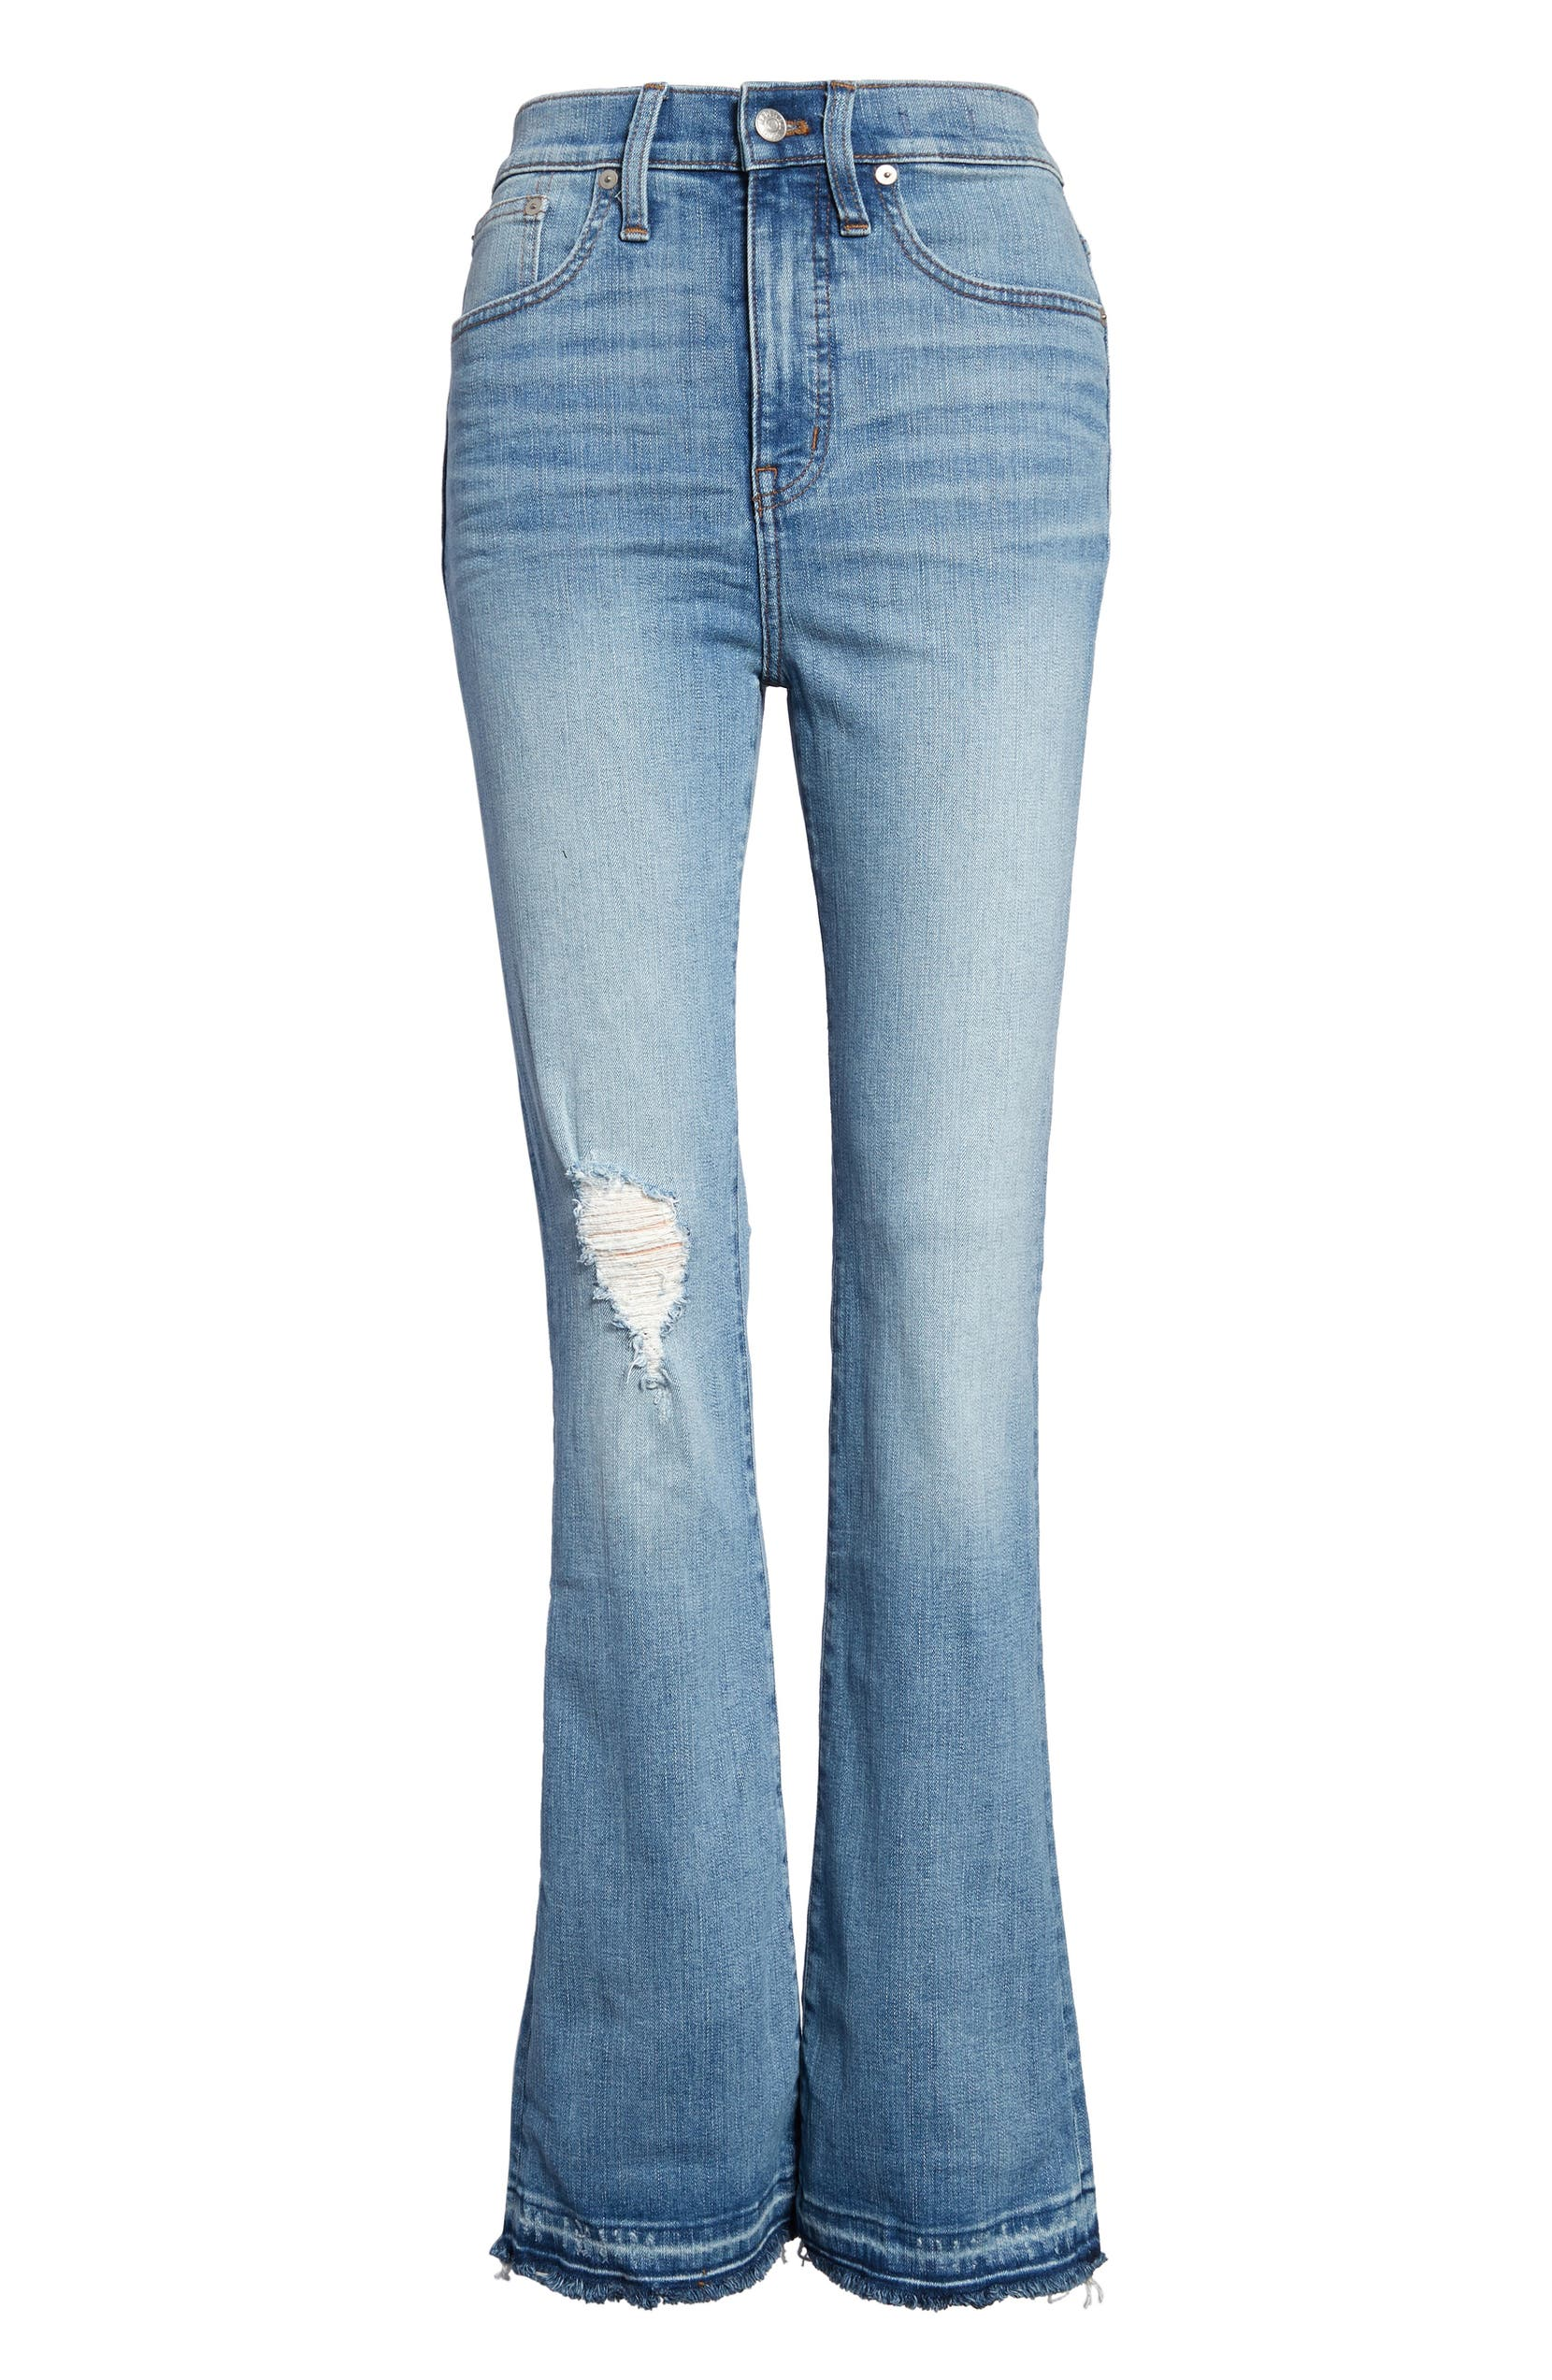 53aaa750c1 High Waist Skinny Flare Jeans